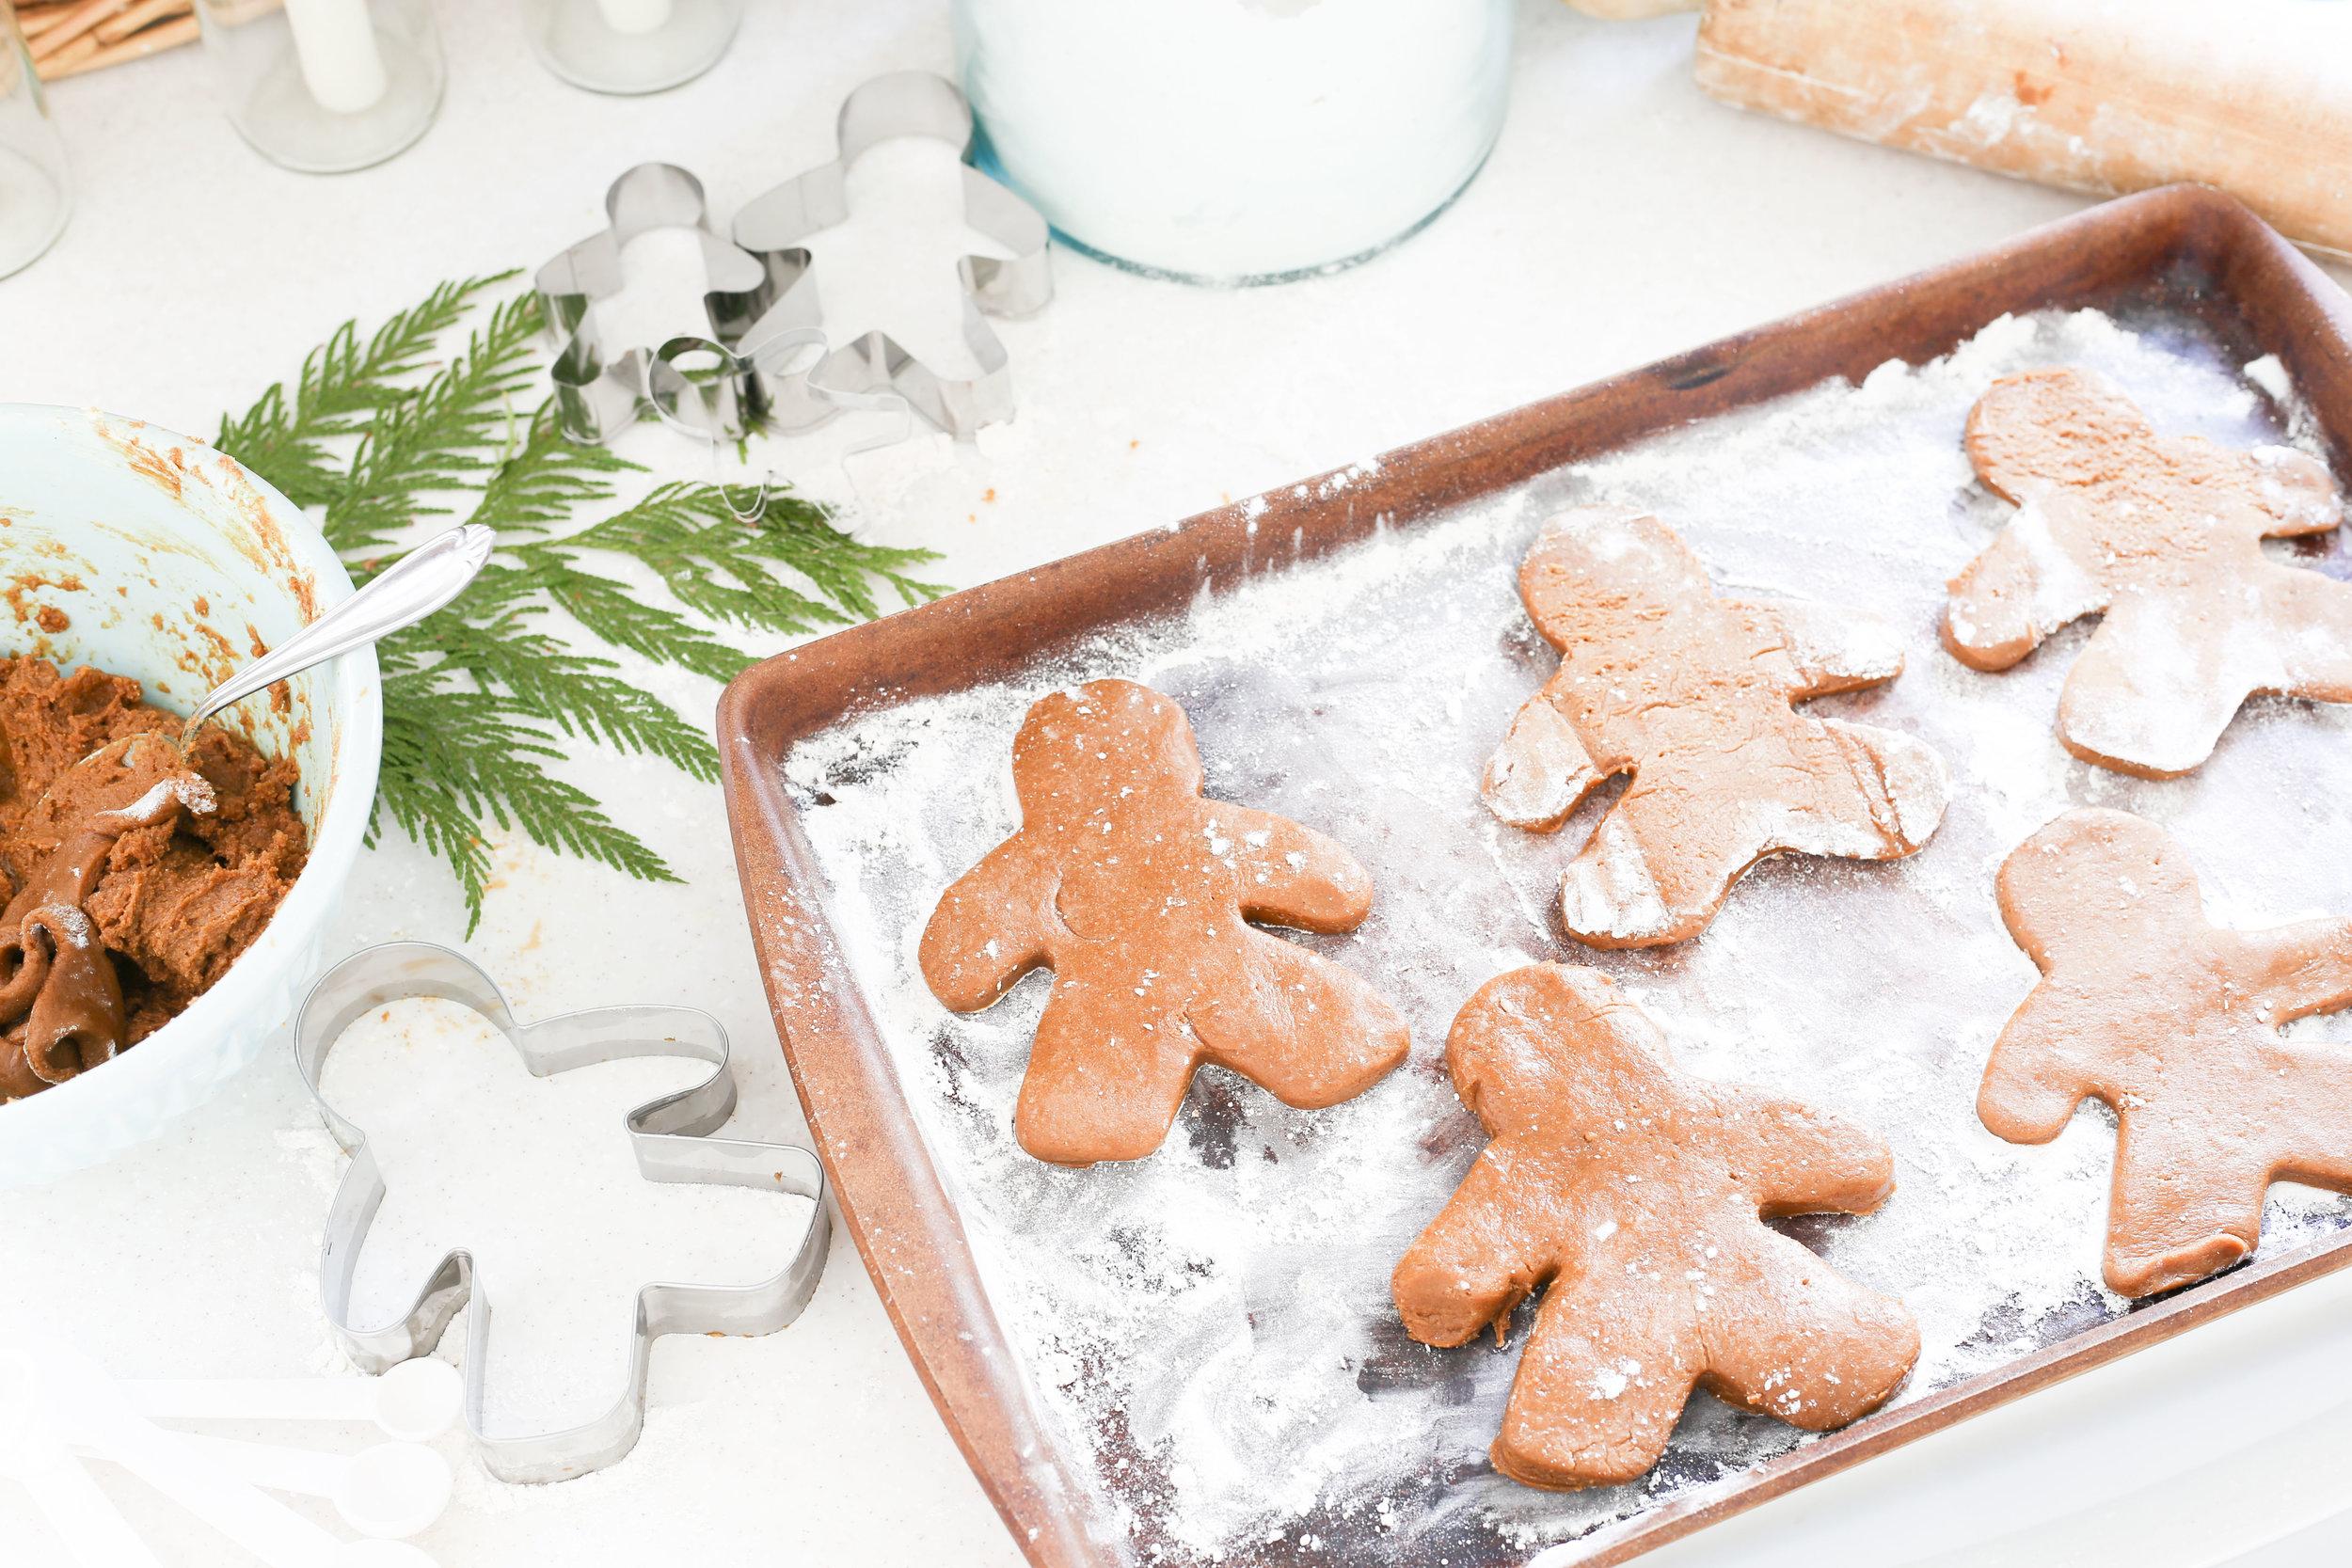 Christmas 2017 Home Tour: Deck The Blogs- Baking Gingerbread Men in the Kitchen- Plum Pretty Decor & Design's Christmas Home Tour